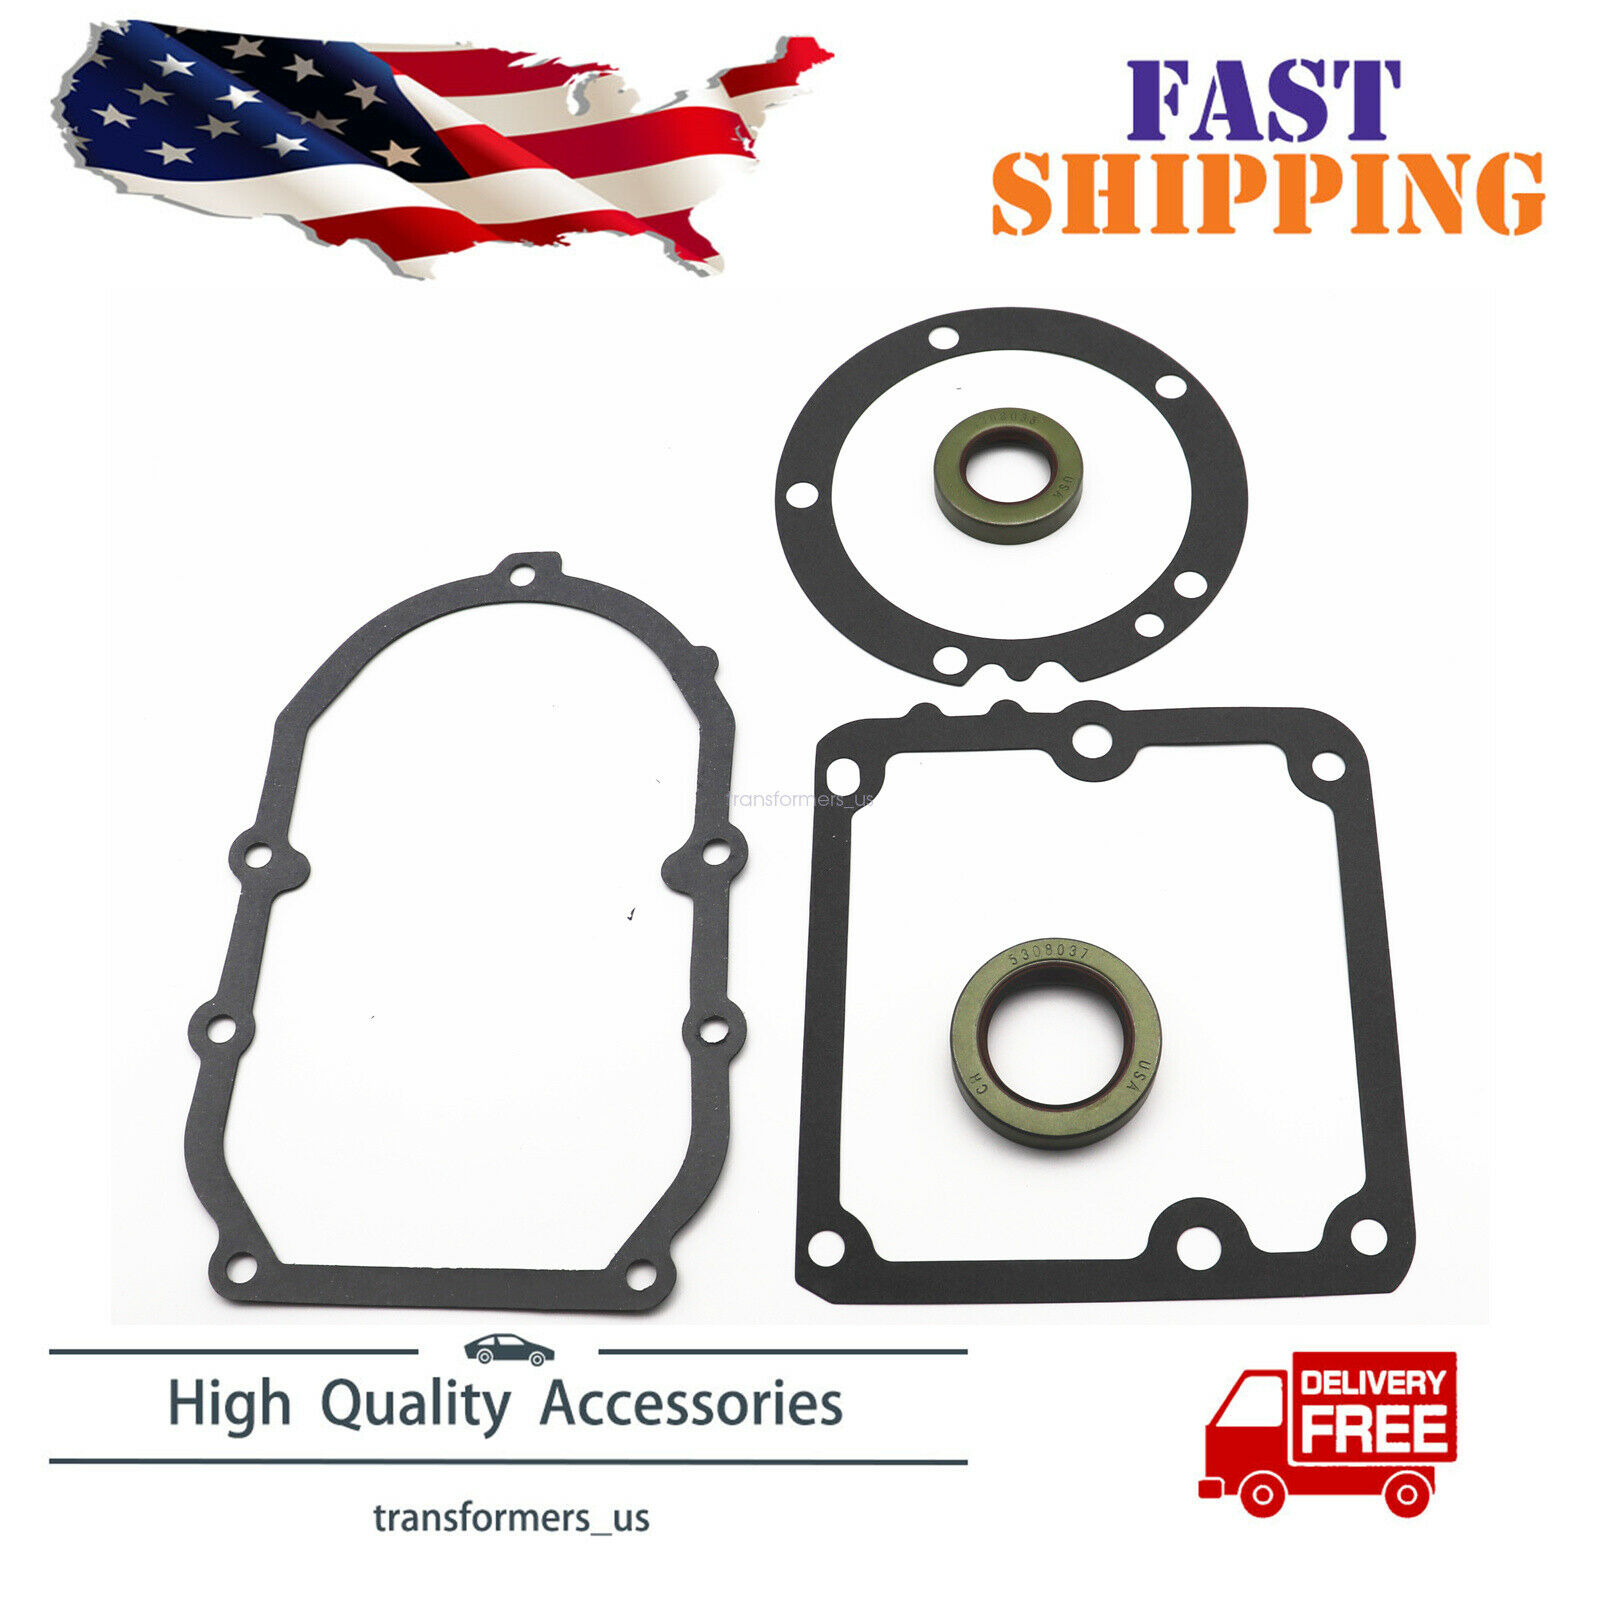 Valve Grind Head Gasket Kit Fits For ONAN BF-B43-48 P 216-218-220 Inc 2 110-3181